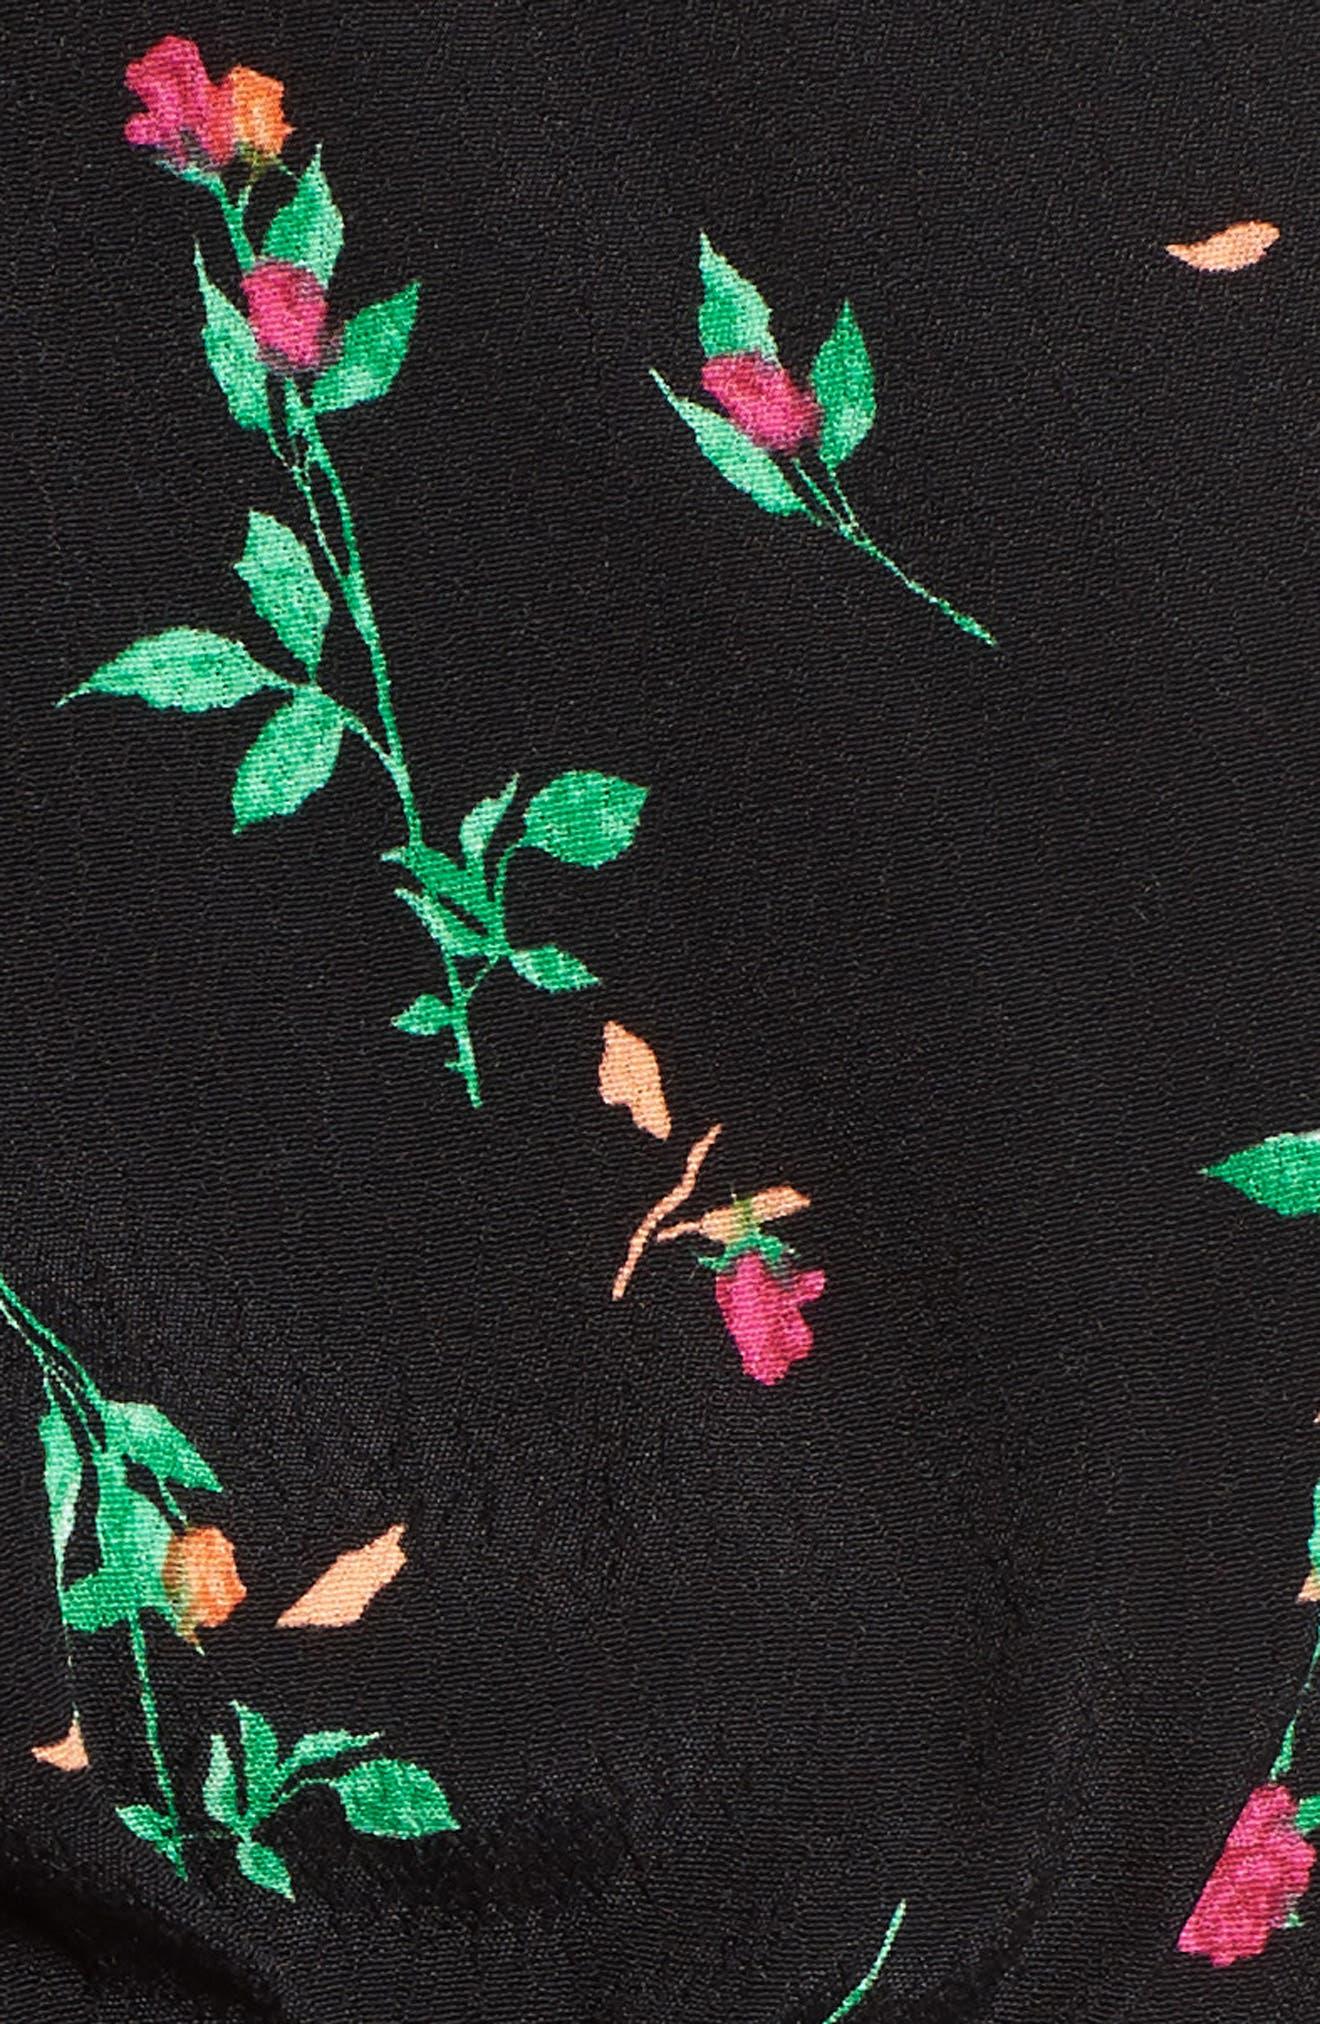 Axel Smocked Top,                             Alternate thumbnail 6, color,                             Noir Rose Ditsy